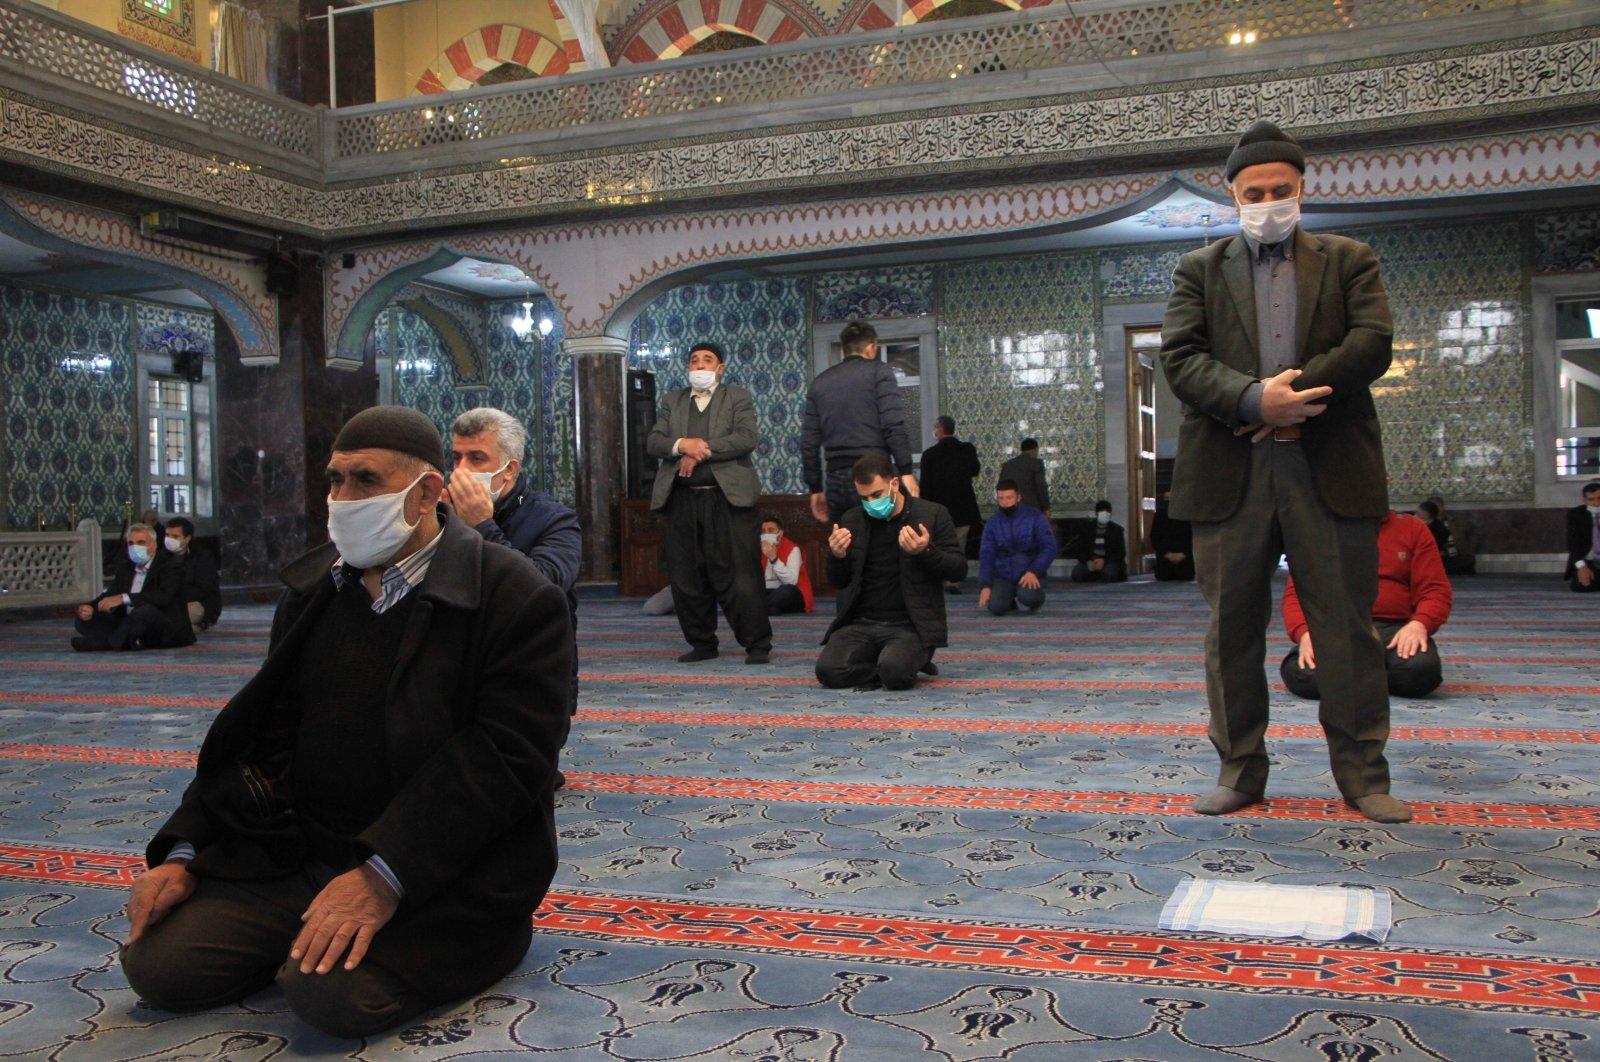 People perform prayers at a mosque in Elazığ, eastern Turkey, April 2, 2021. (IHA PHOTO)